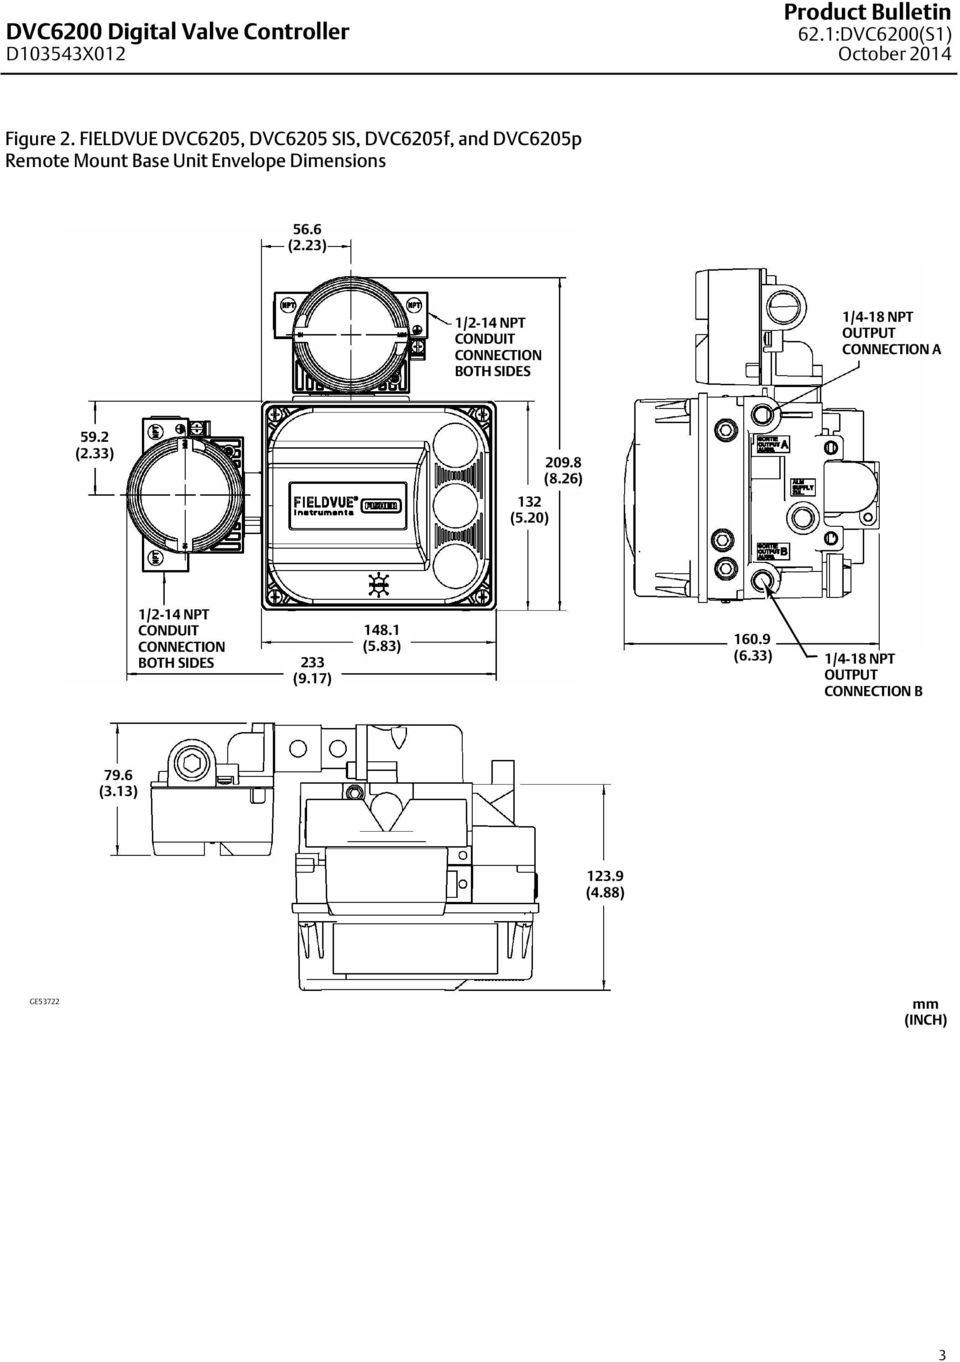 Fisher FIELDVUE DVC6200 Digital Valve Controller / Magnet